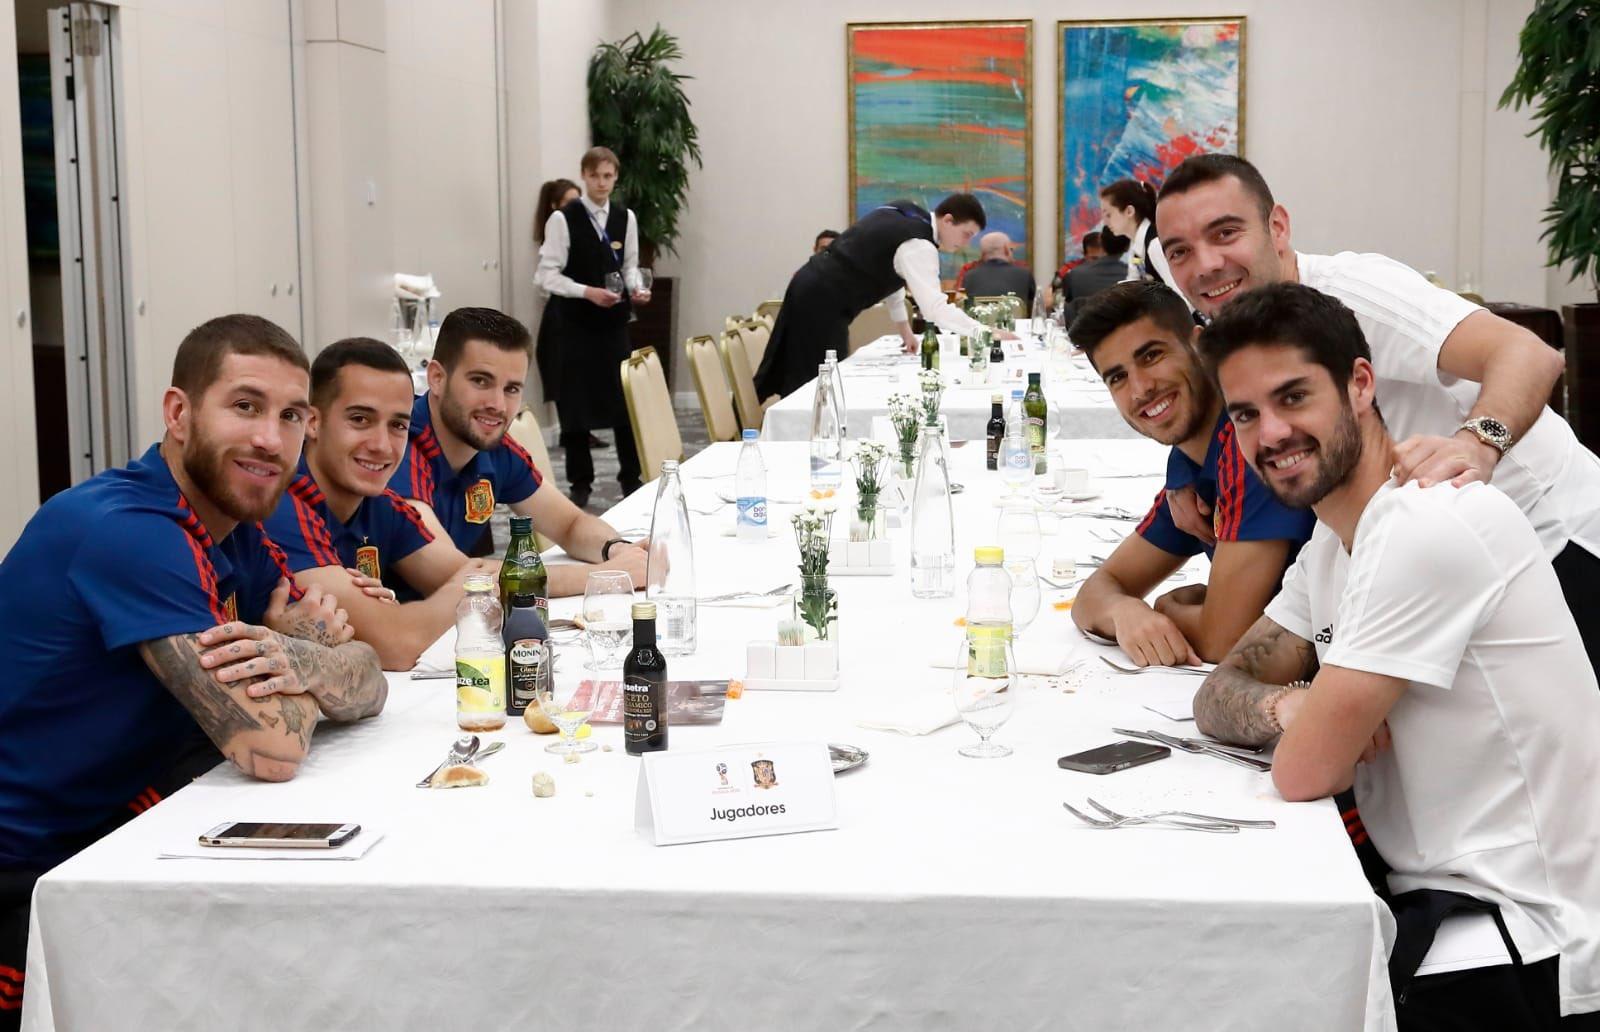 Lunch time ���� #VamosEspaña ���� https://t.co/75Gqdj3WcX